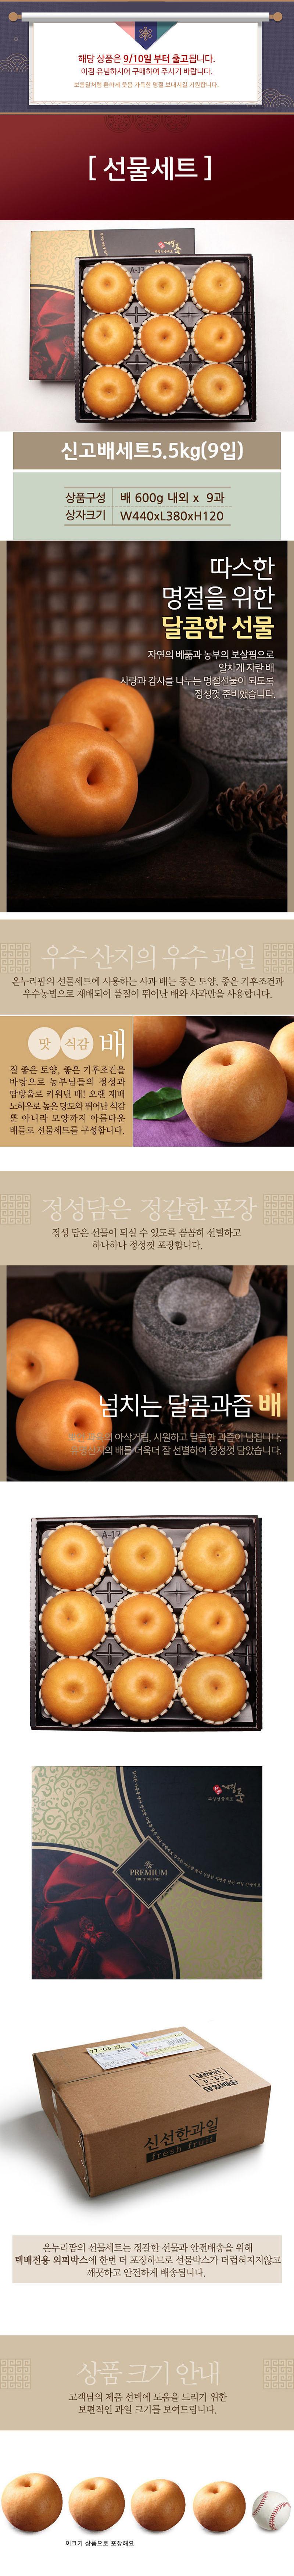 new_pear9.jpg